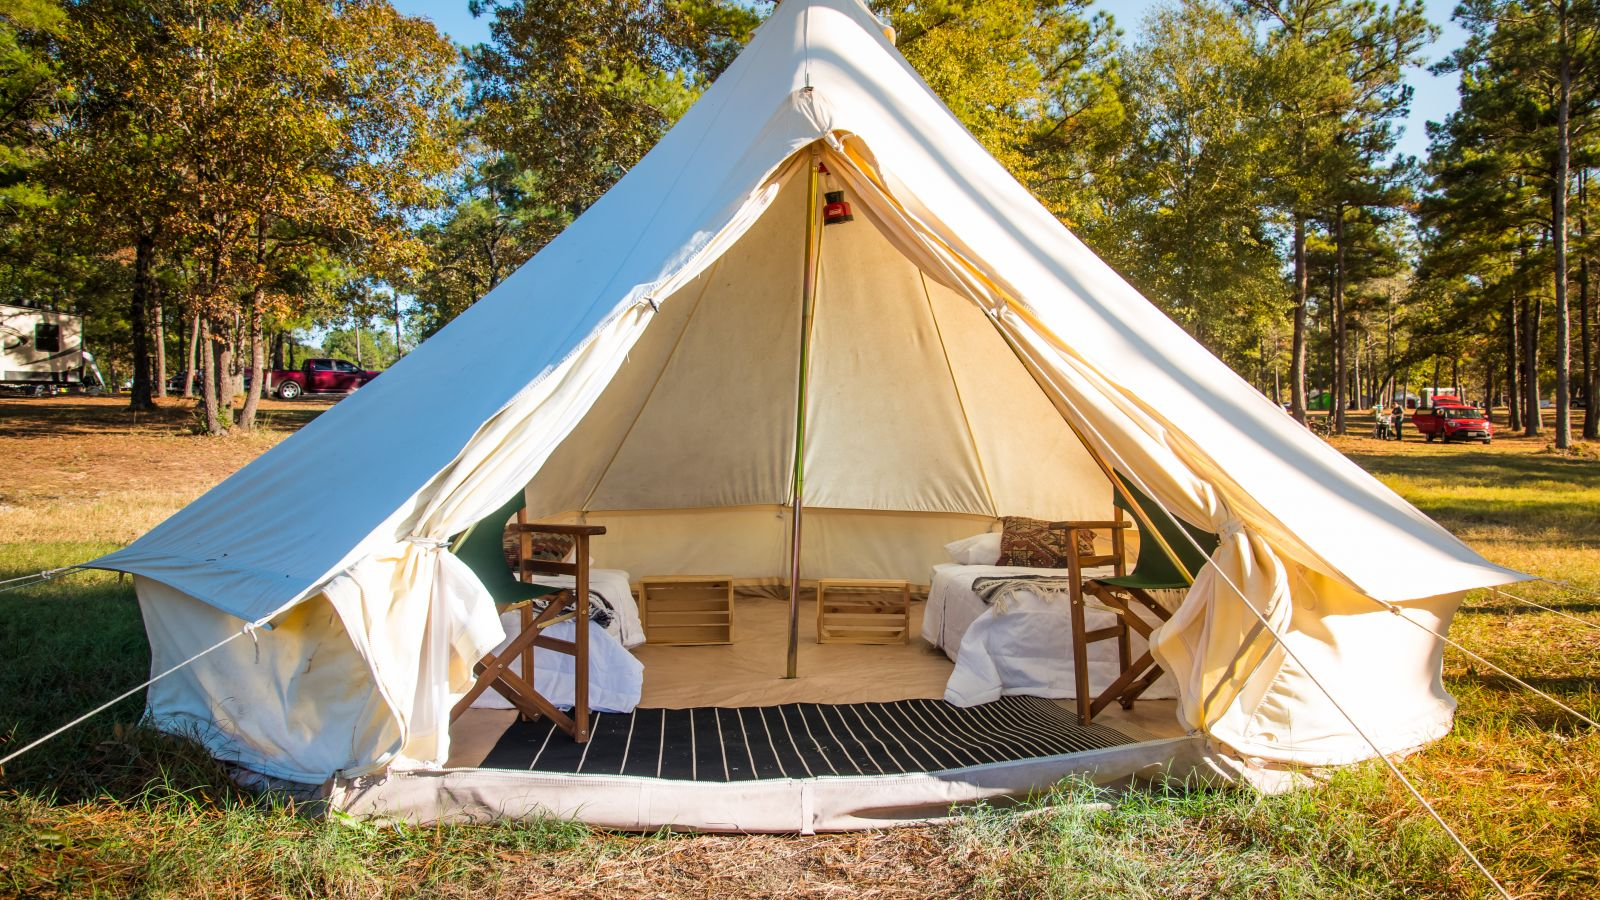 a tent in a grassy area